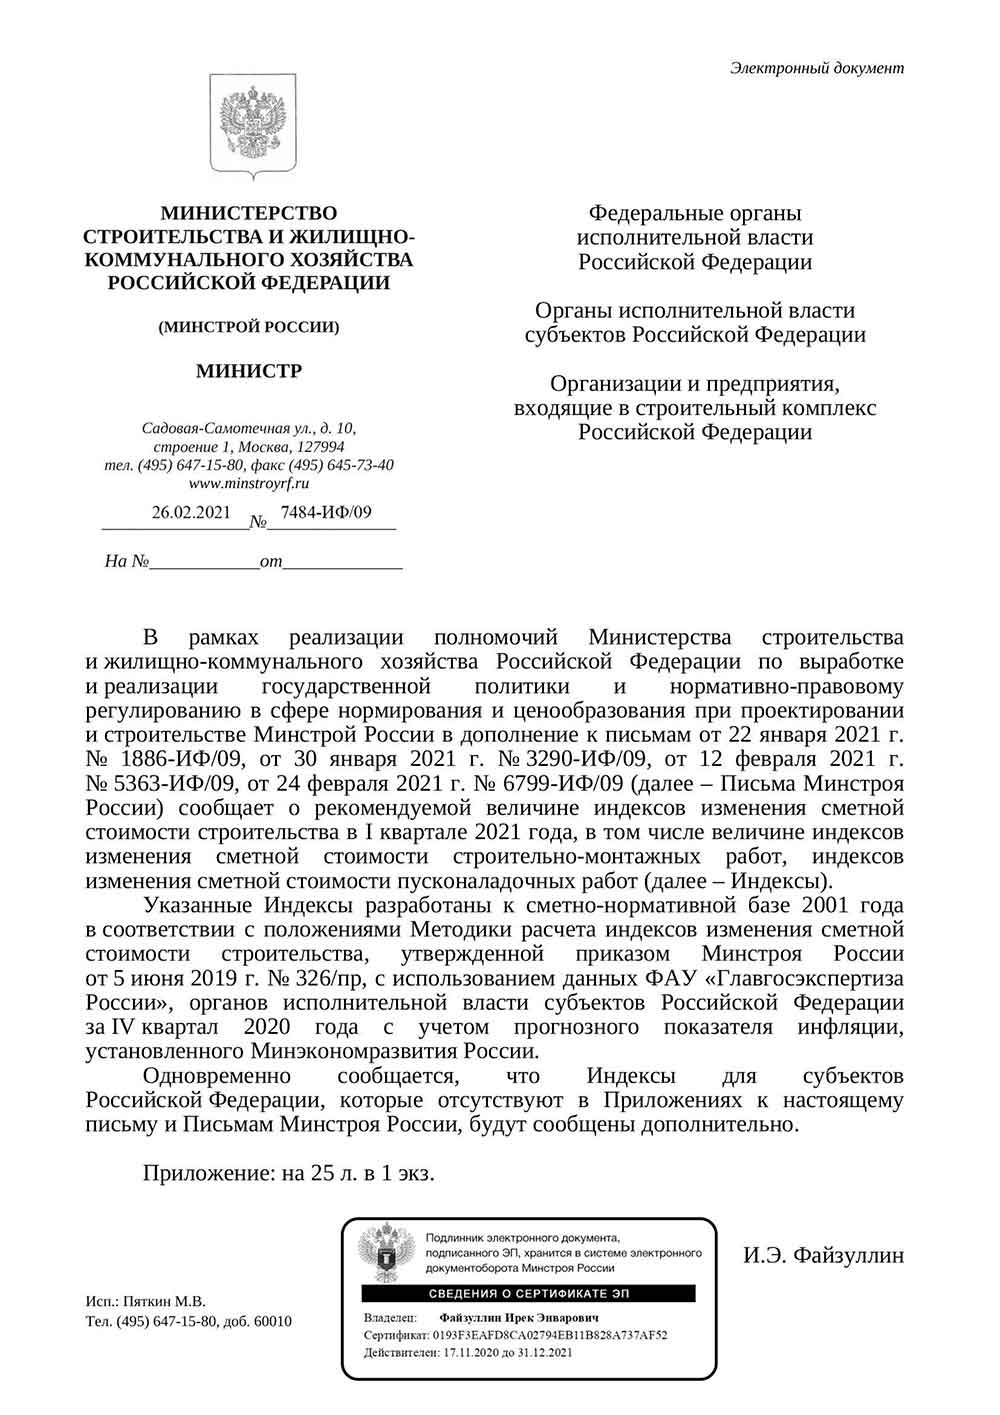 Письмо Минстроя РФ №7484-ИФ/09 от 26.02.2021 г.